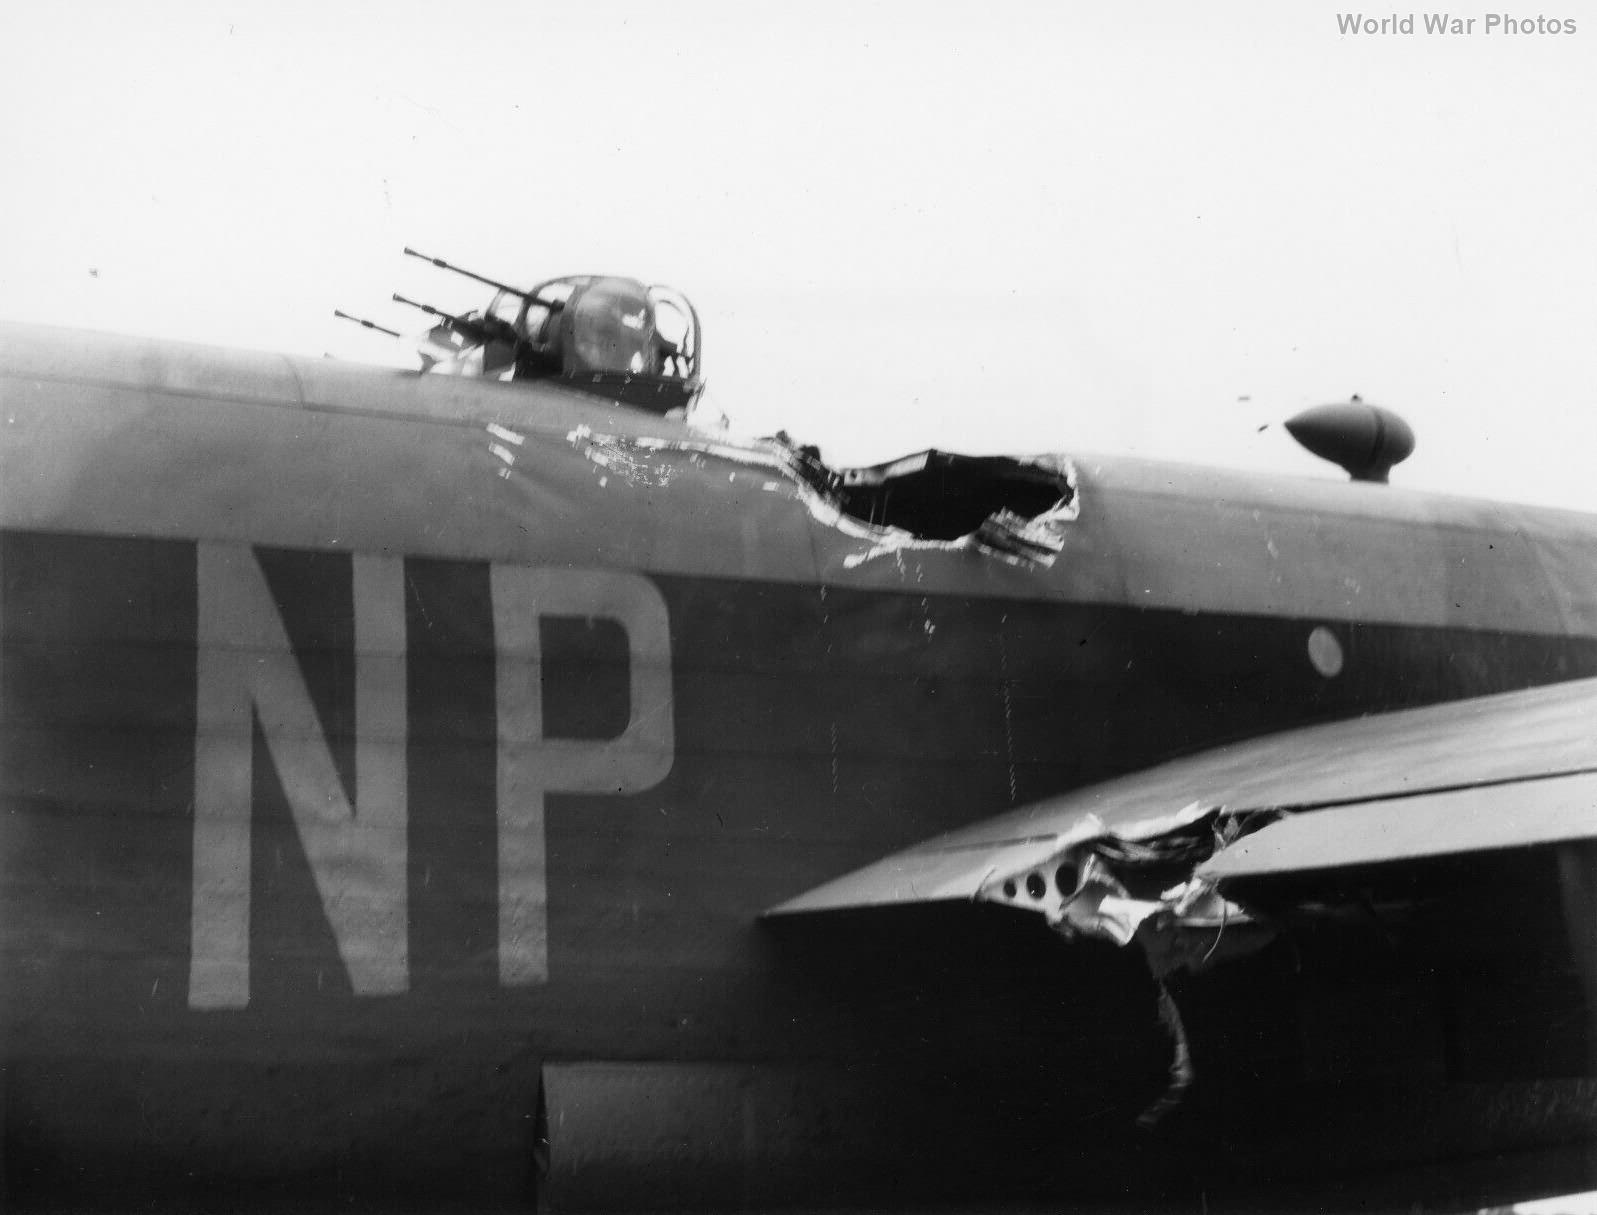 Halifax HR837 NP-F 158 Sqn hit by 1000 lb bomb 3